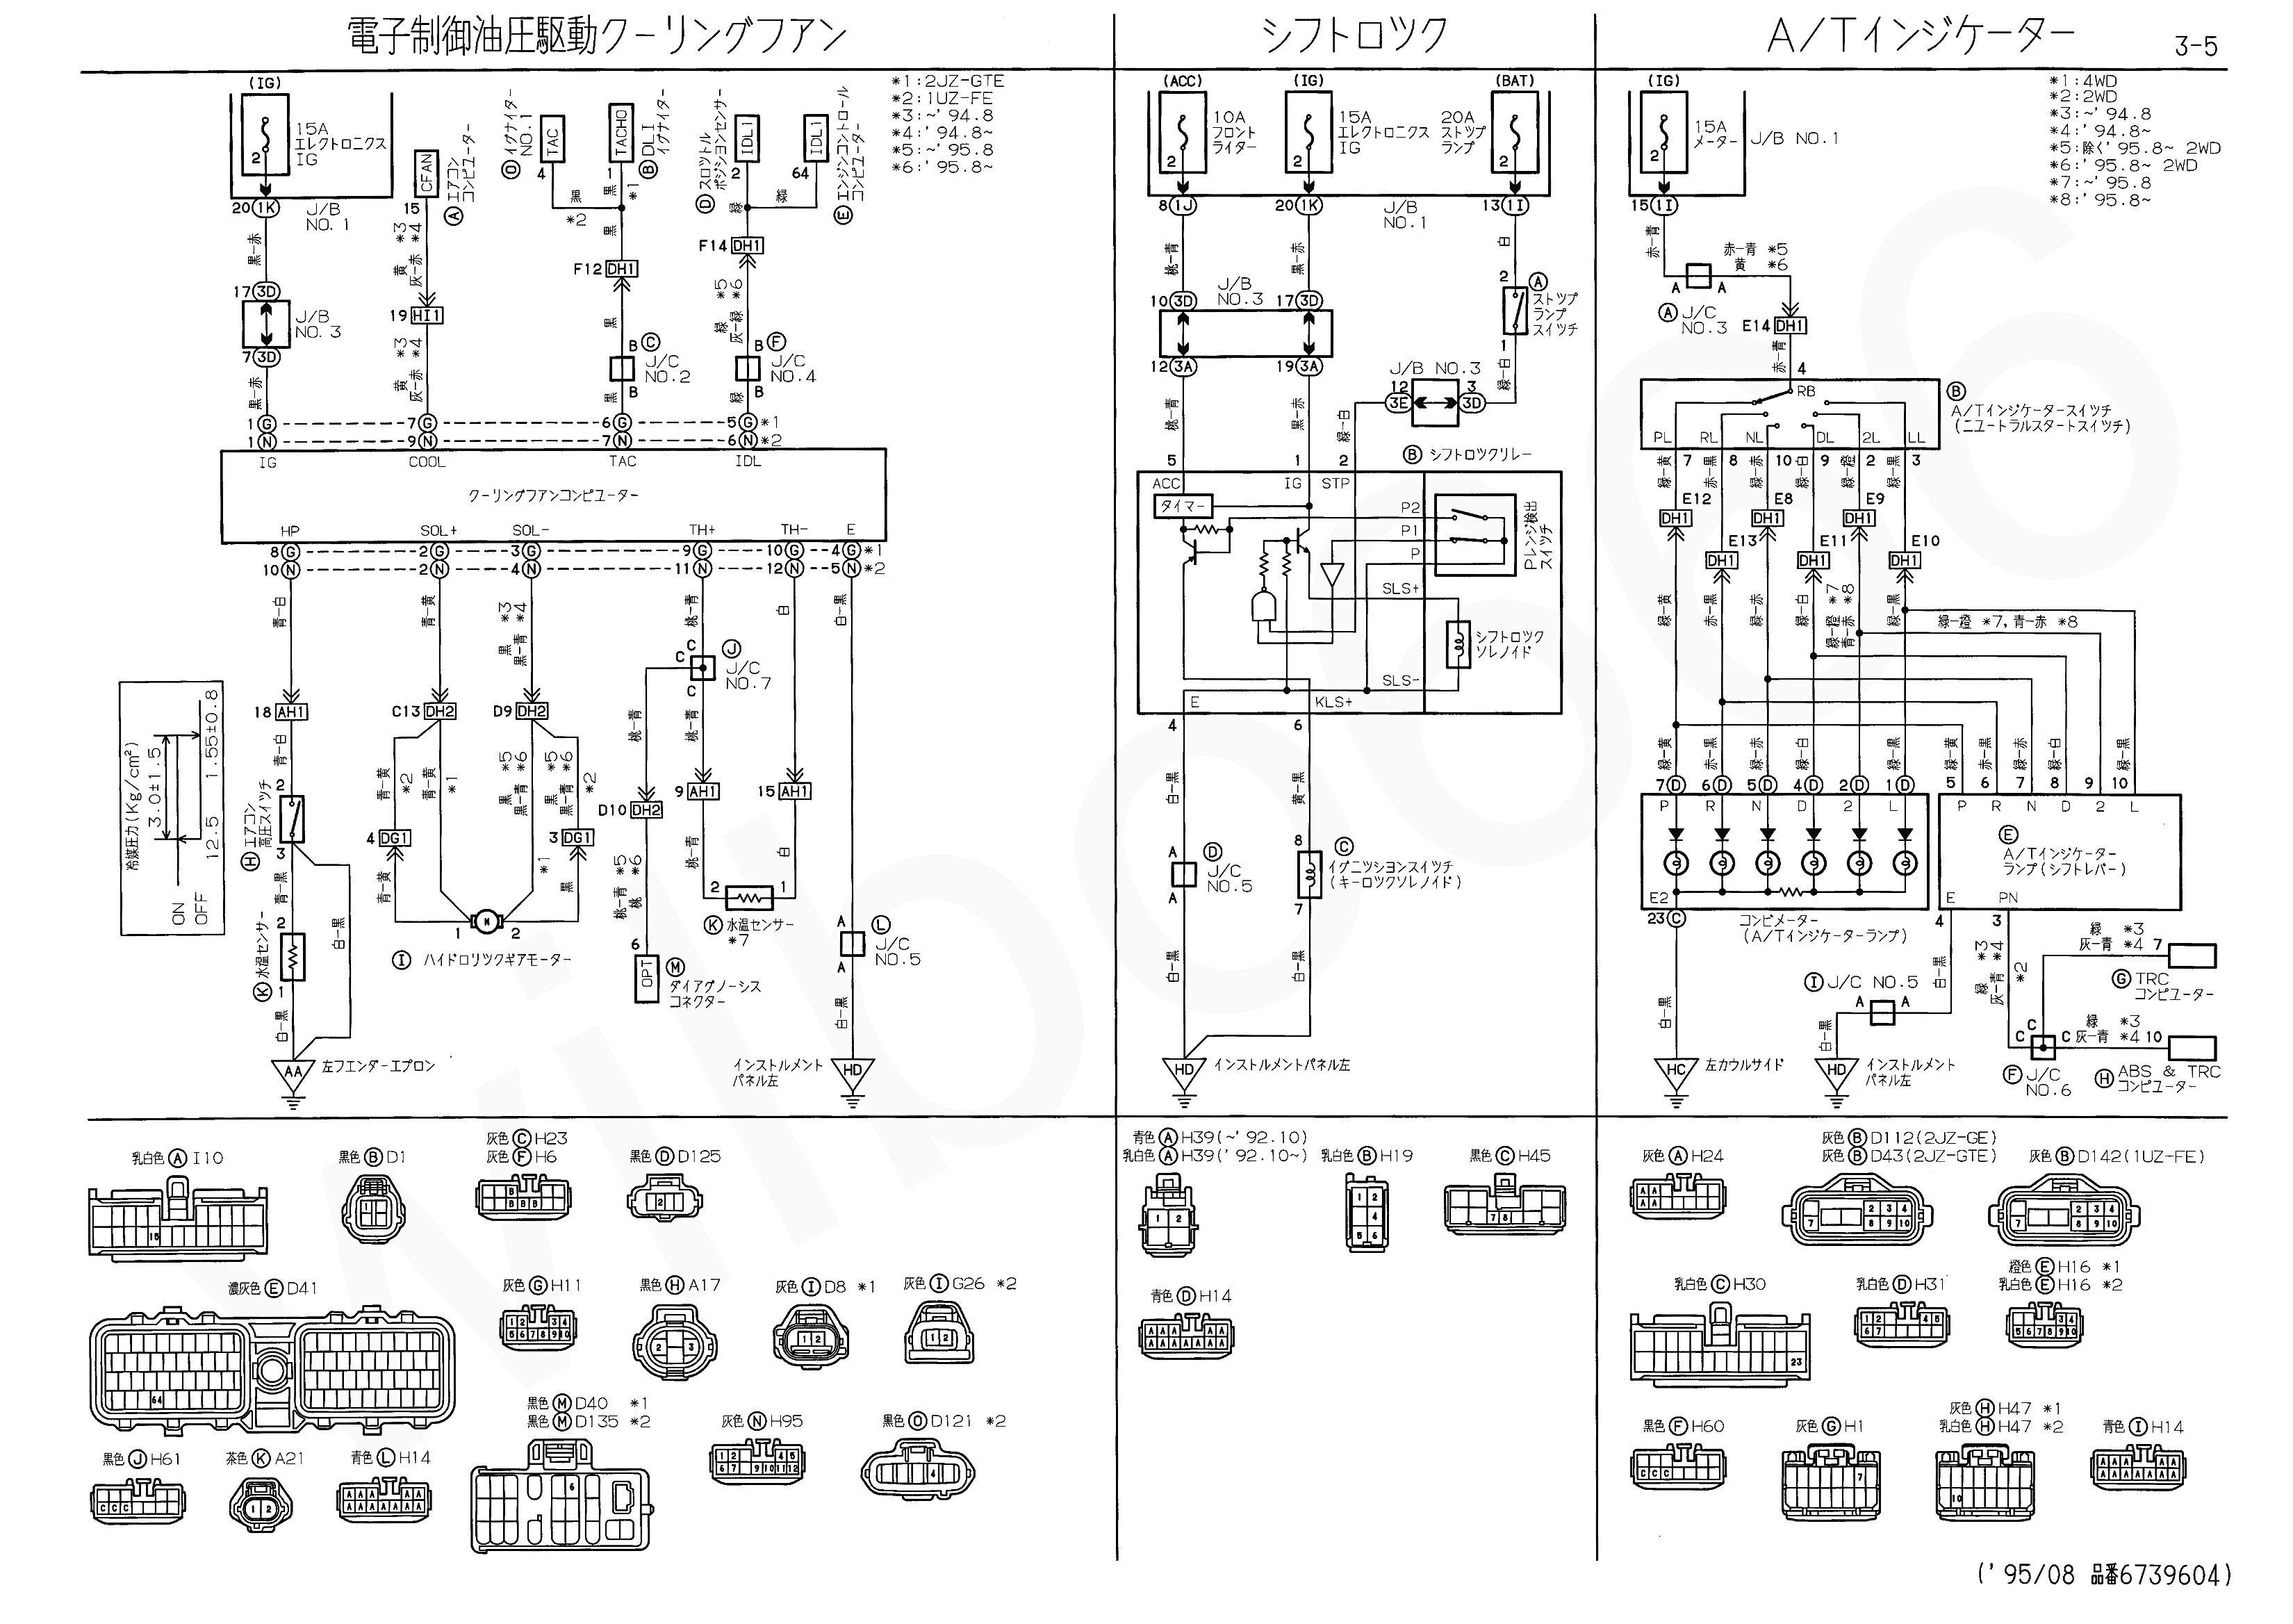 Wiring Diagram Maytag Hotpoint Dryer Timer Diagram Fresh Diagram For Ge Dryer Fresh